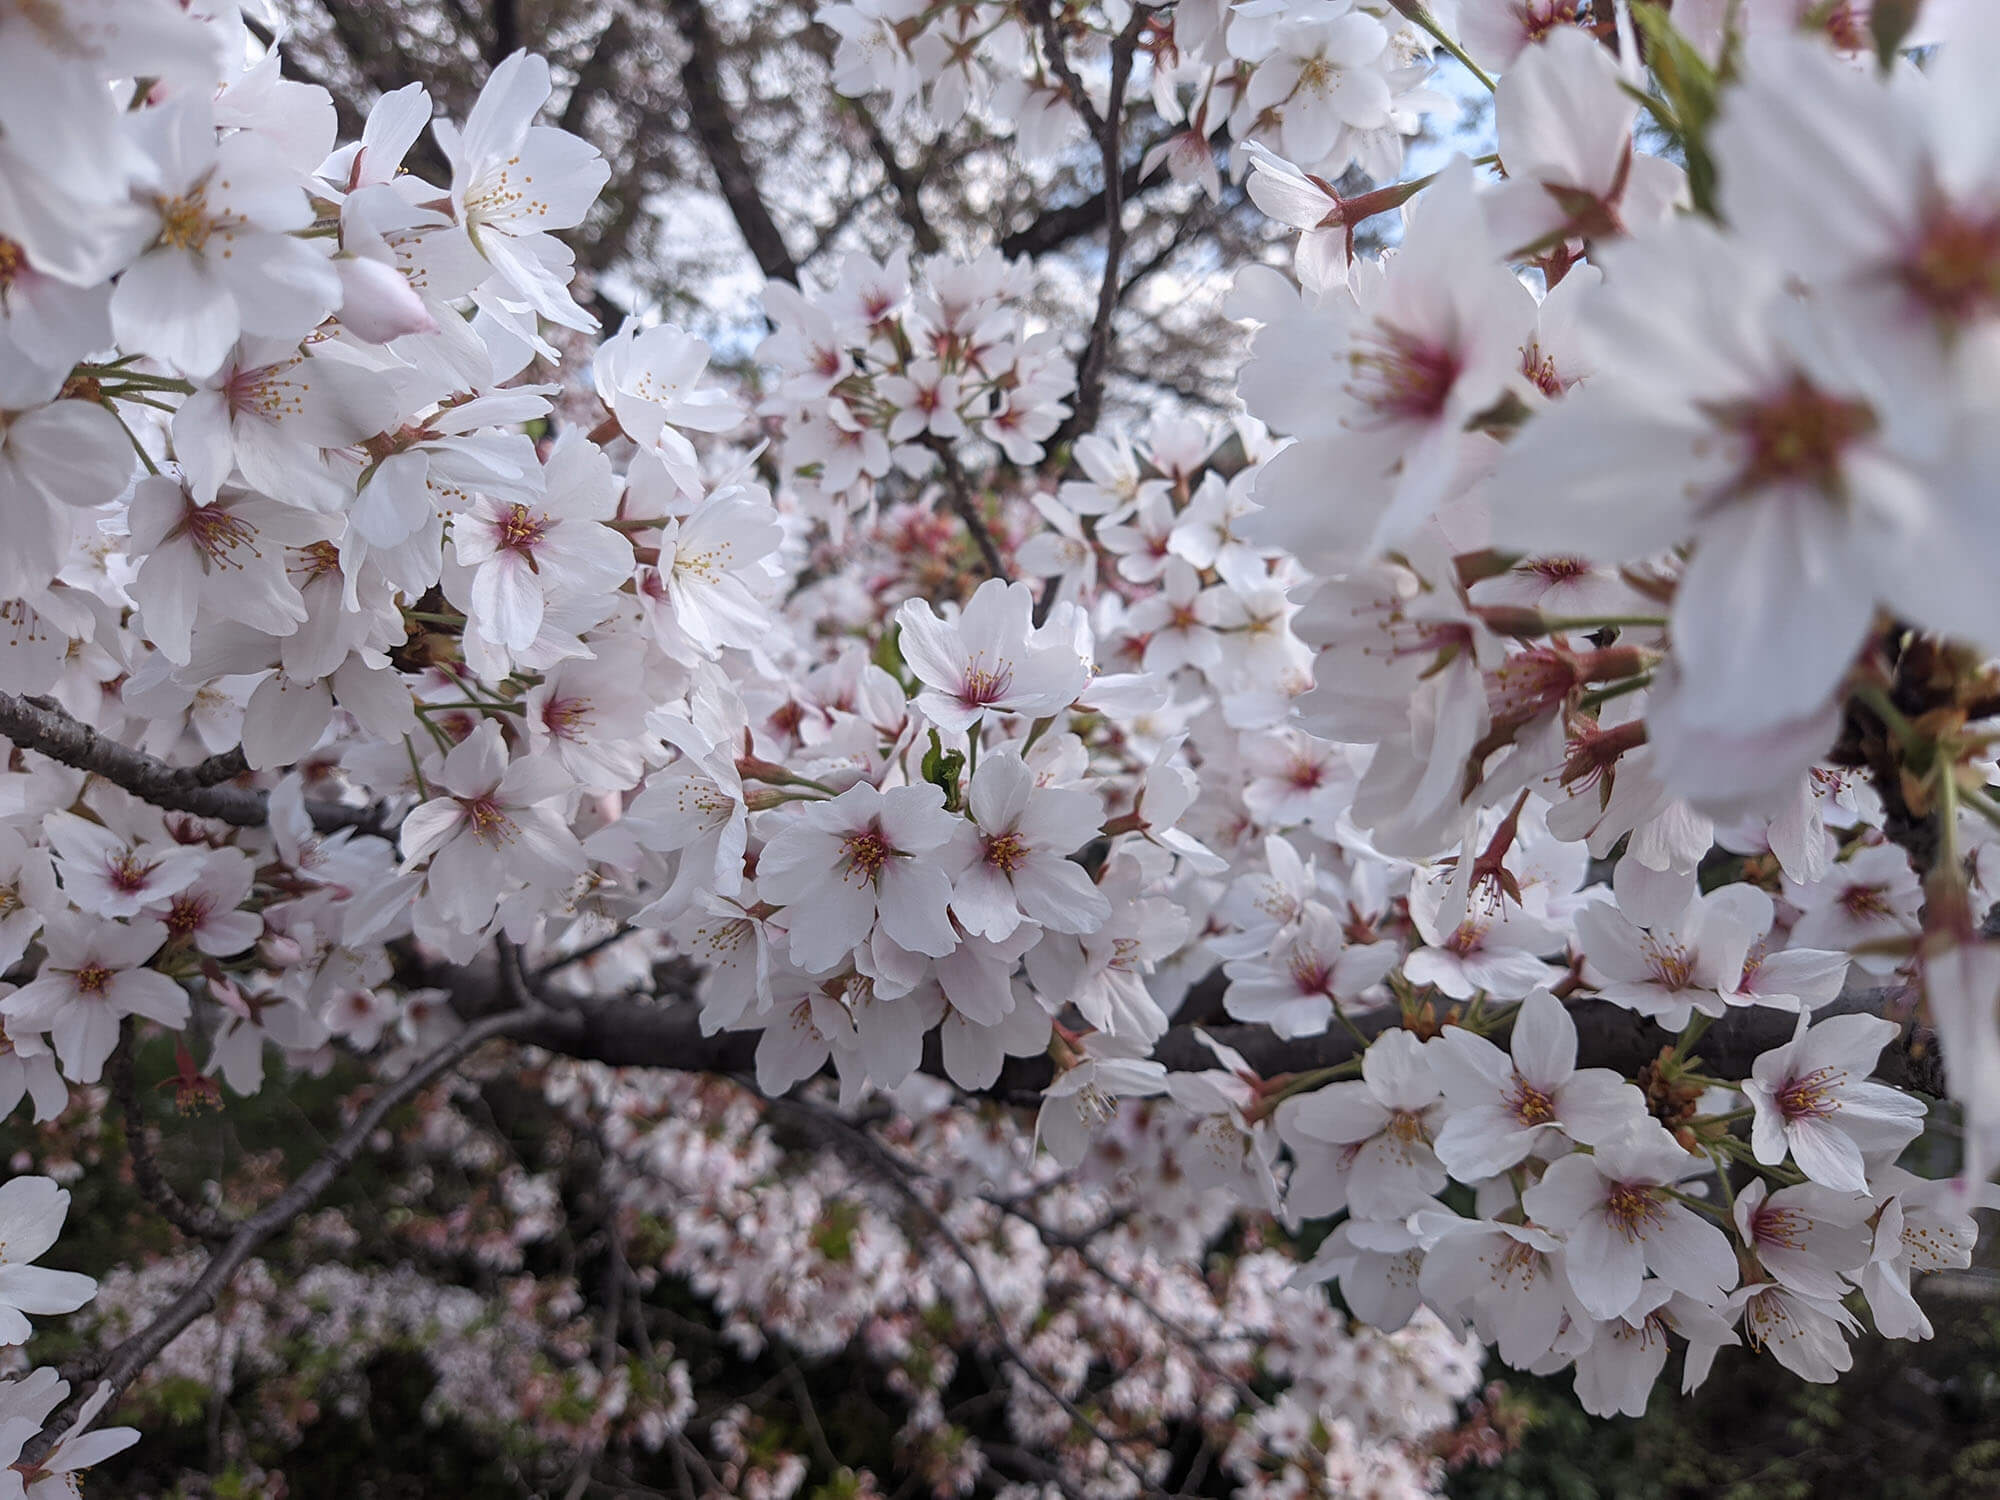 Redmi 9Tで撮影した桜の写真